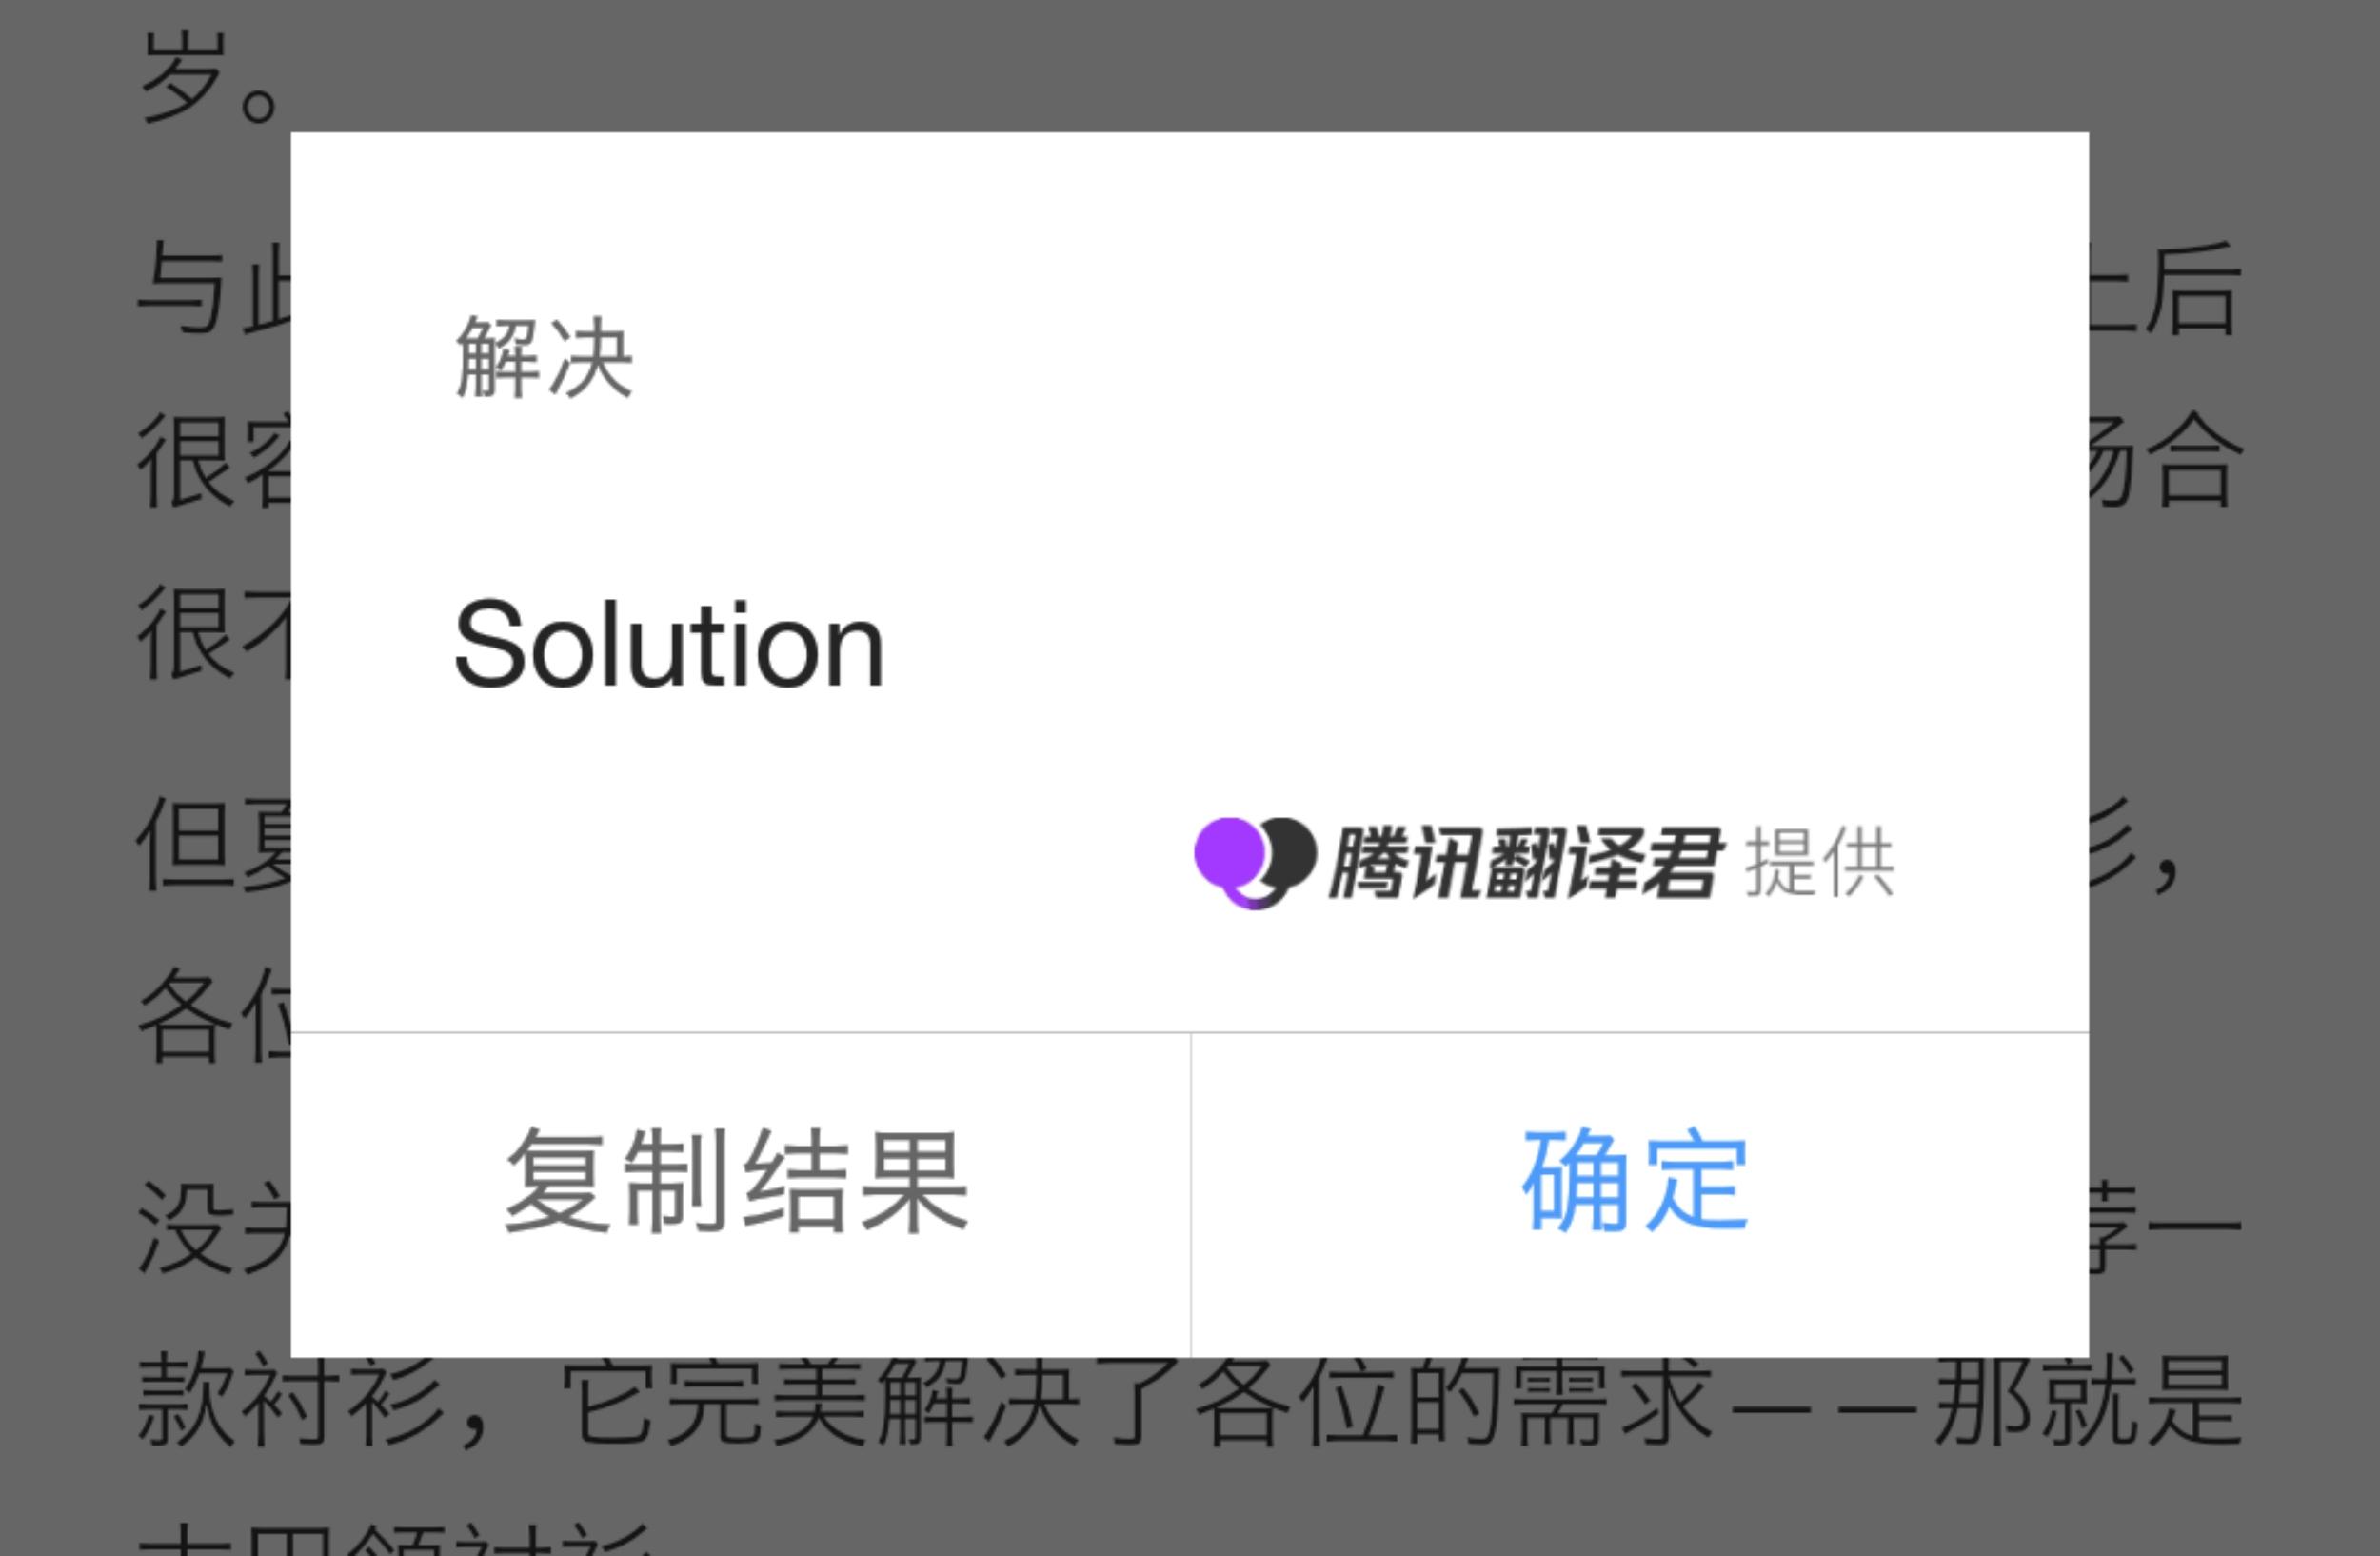 Screenshot_2019-08-23-15-44-19-153_????.png